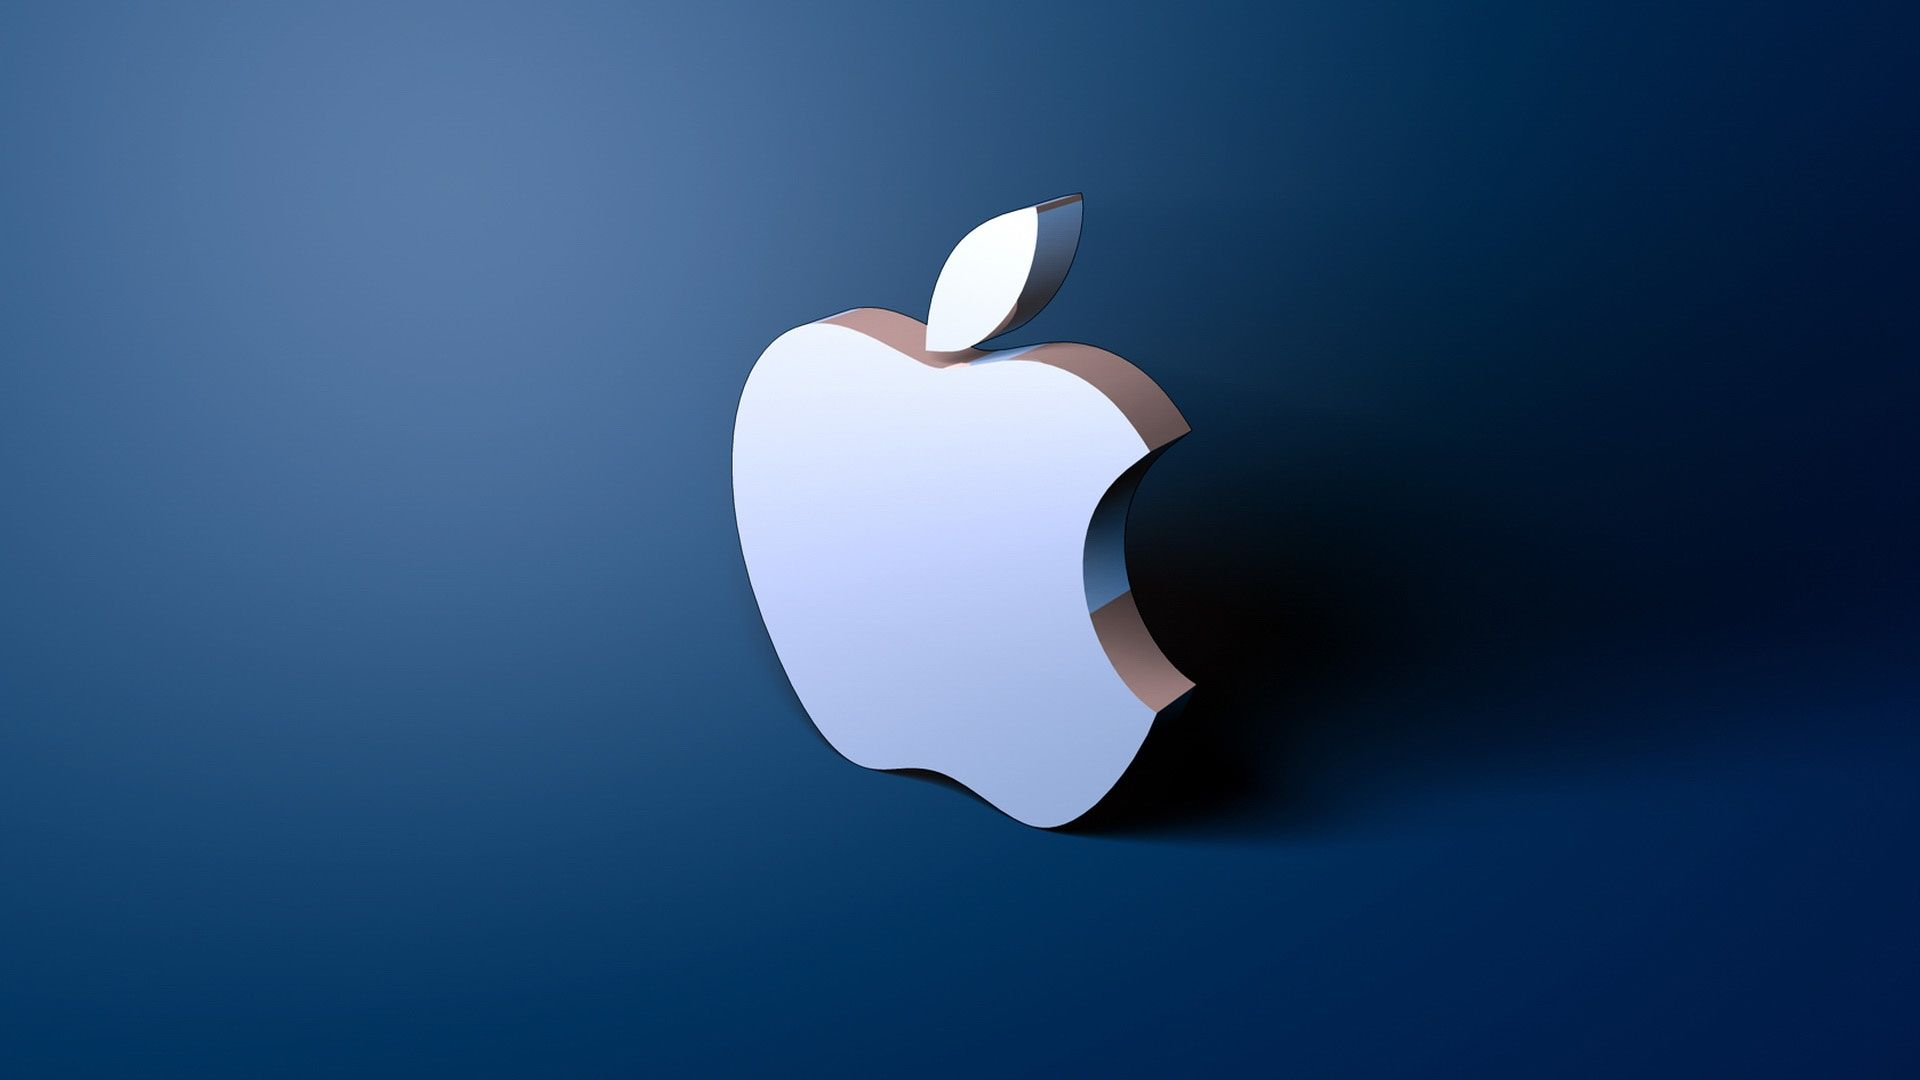 Hd wallpaper macbook - Hd Apple Wallpaper Desktop Wallpapers System Wallpaper Wallpapers Hd For Apple Wallpapers